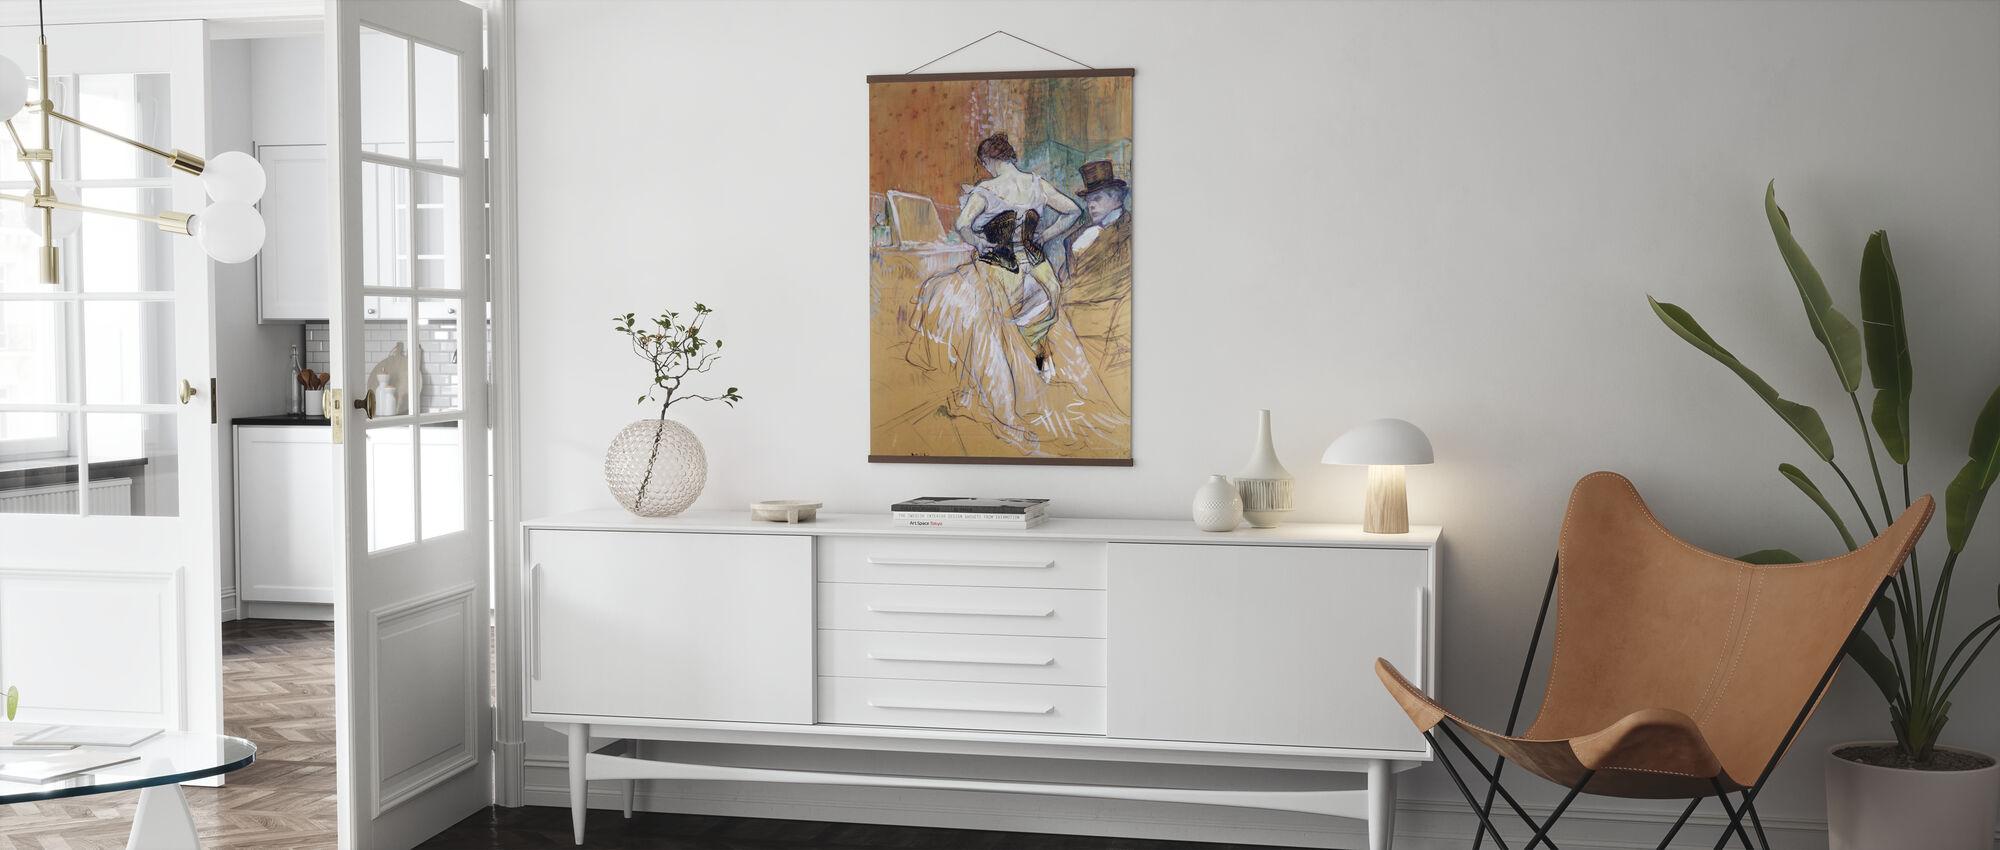 Women at her Toilet, Henri Toulouse Lautrec - Poster - Living Room